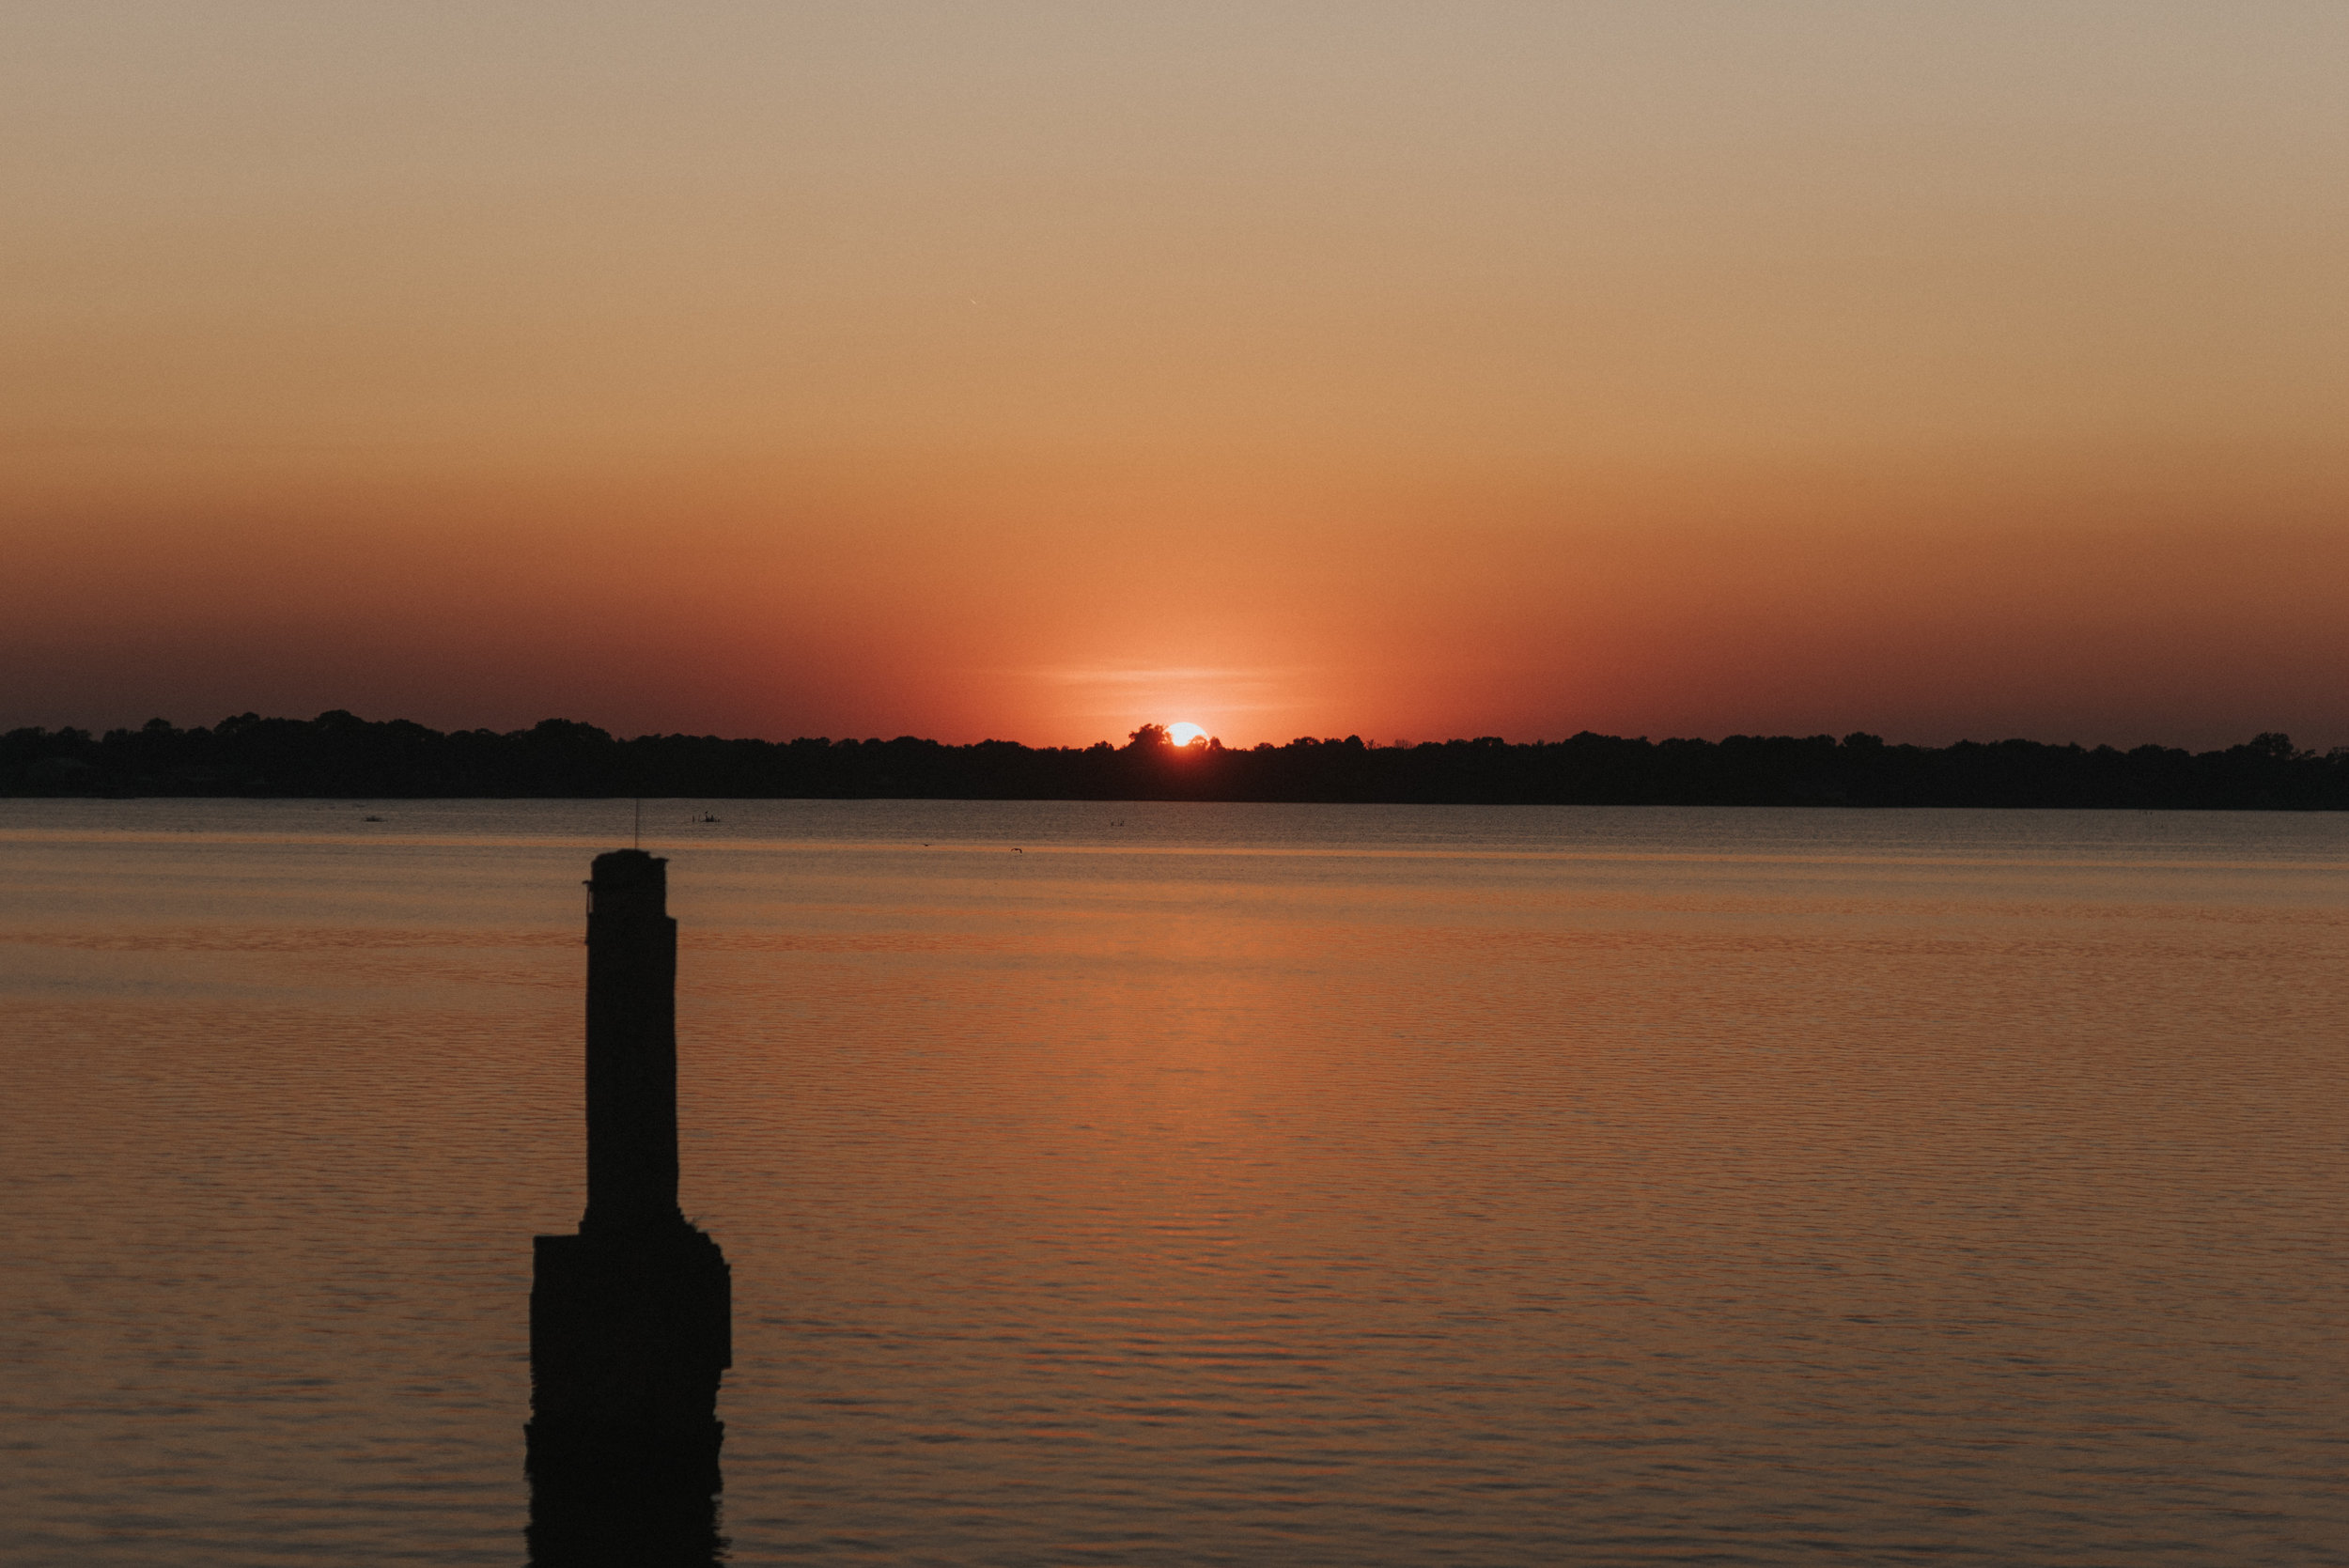 Southern Fete, Southern Wedding, Lake Sunset